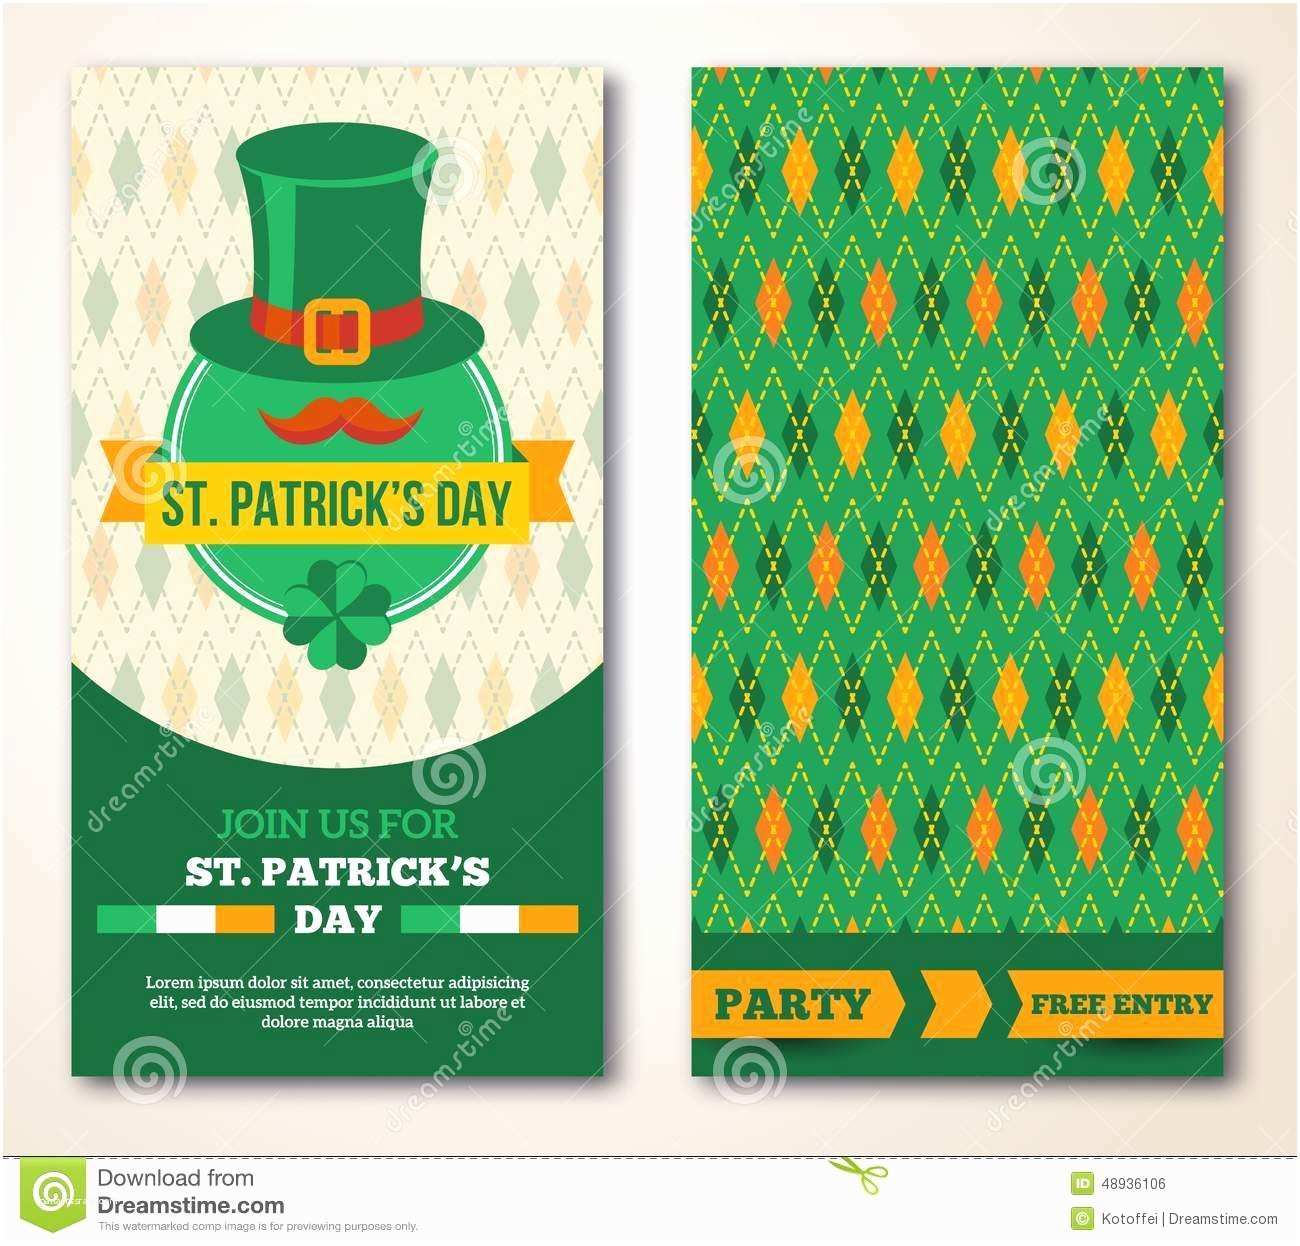 St Patricks Day Party Invitations St Patrick's Day Party Invitations Free Templates